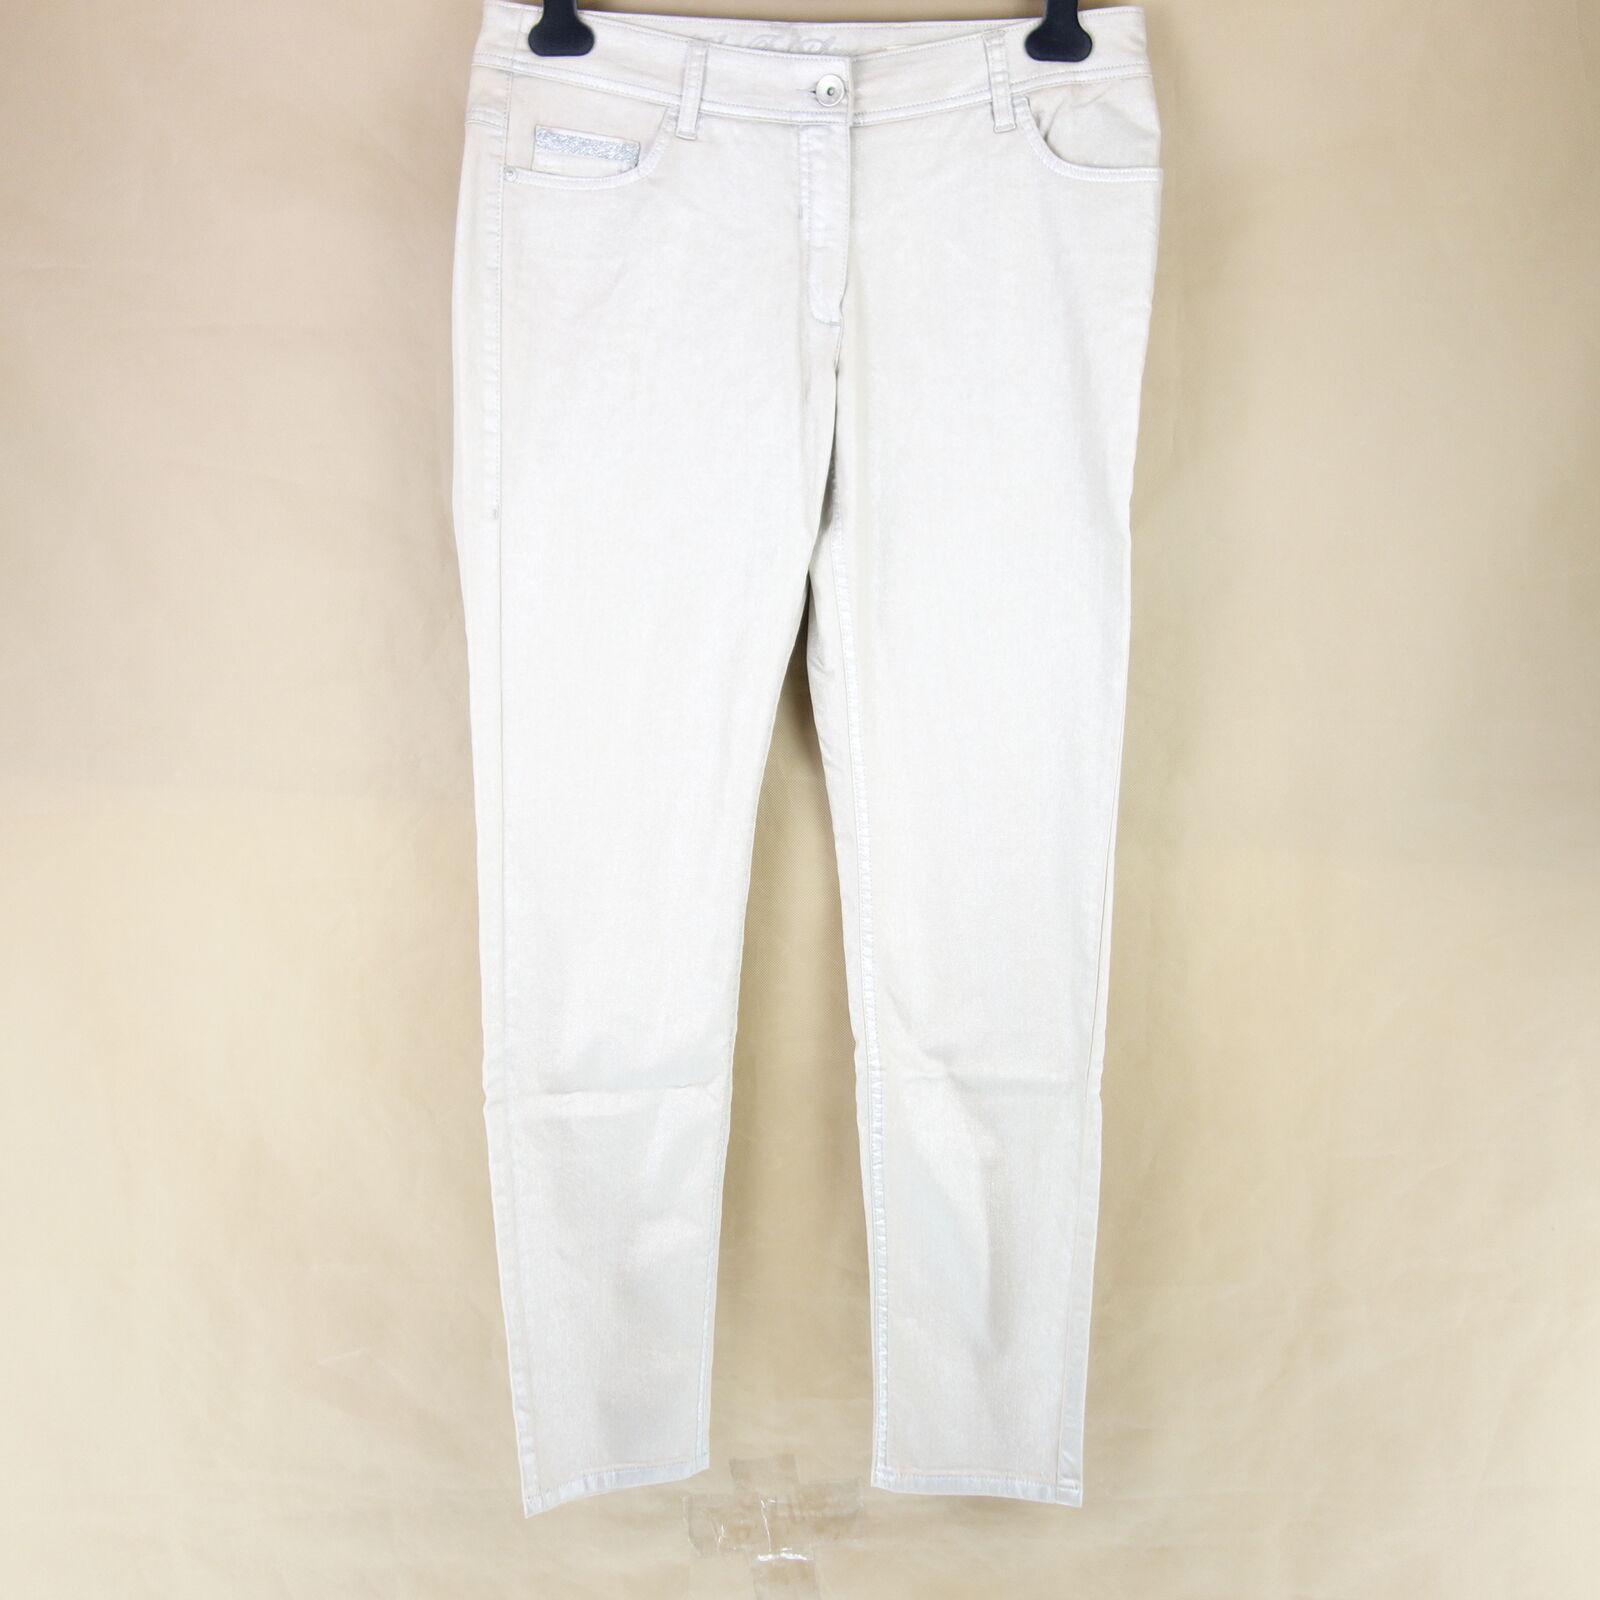 Laurèl Laurel Women's Jeans Trousers Lisa Skinny Size 42 Beige Rhinestones Np199